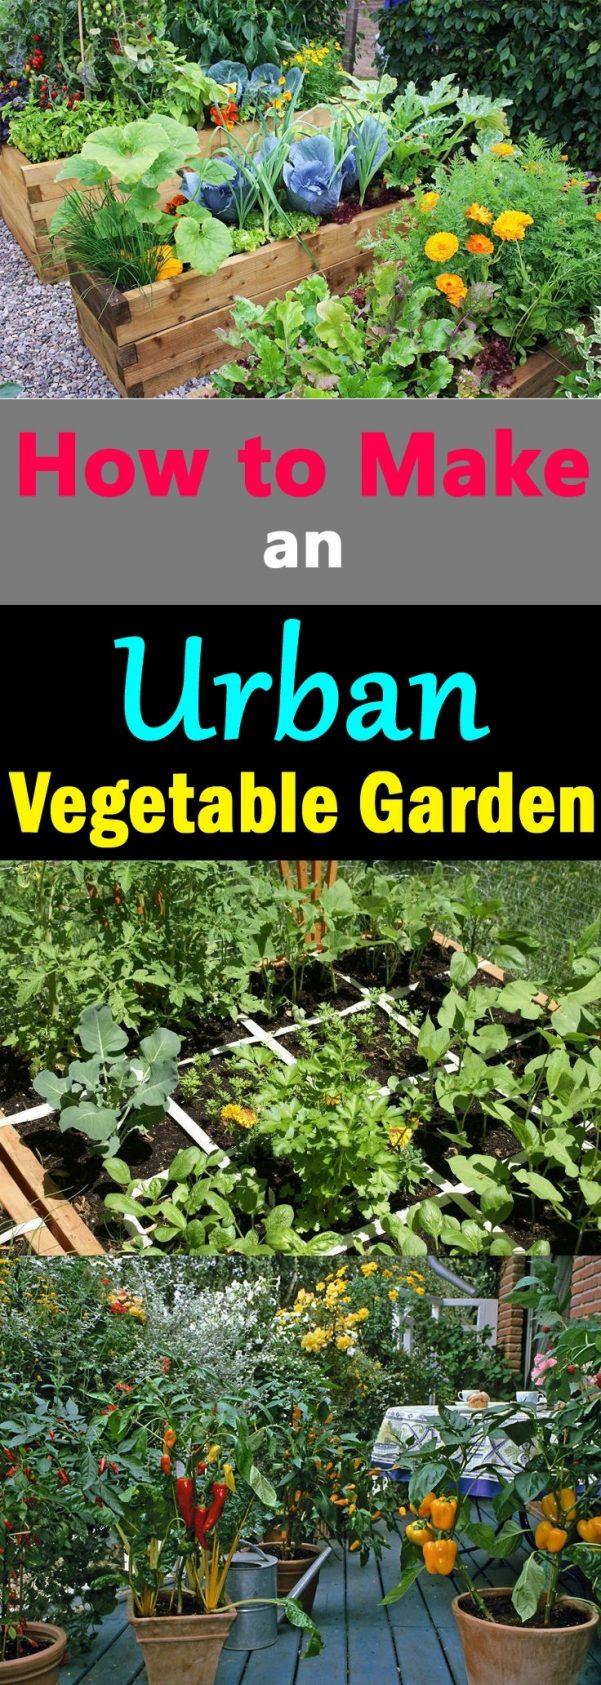 starting an urban vegetable garden photo - 9